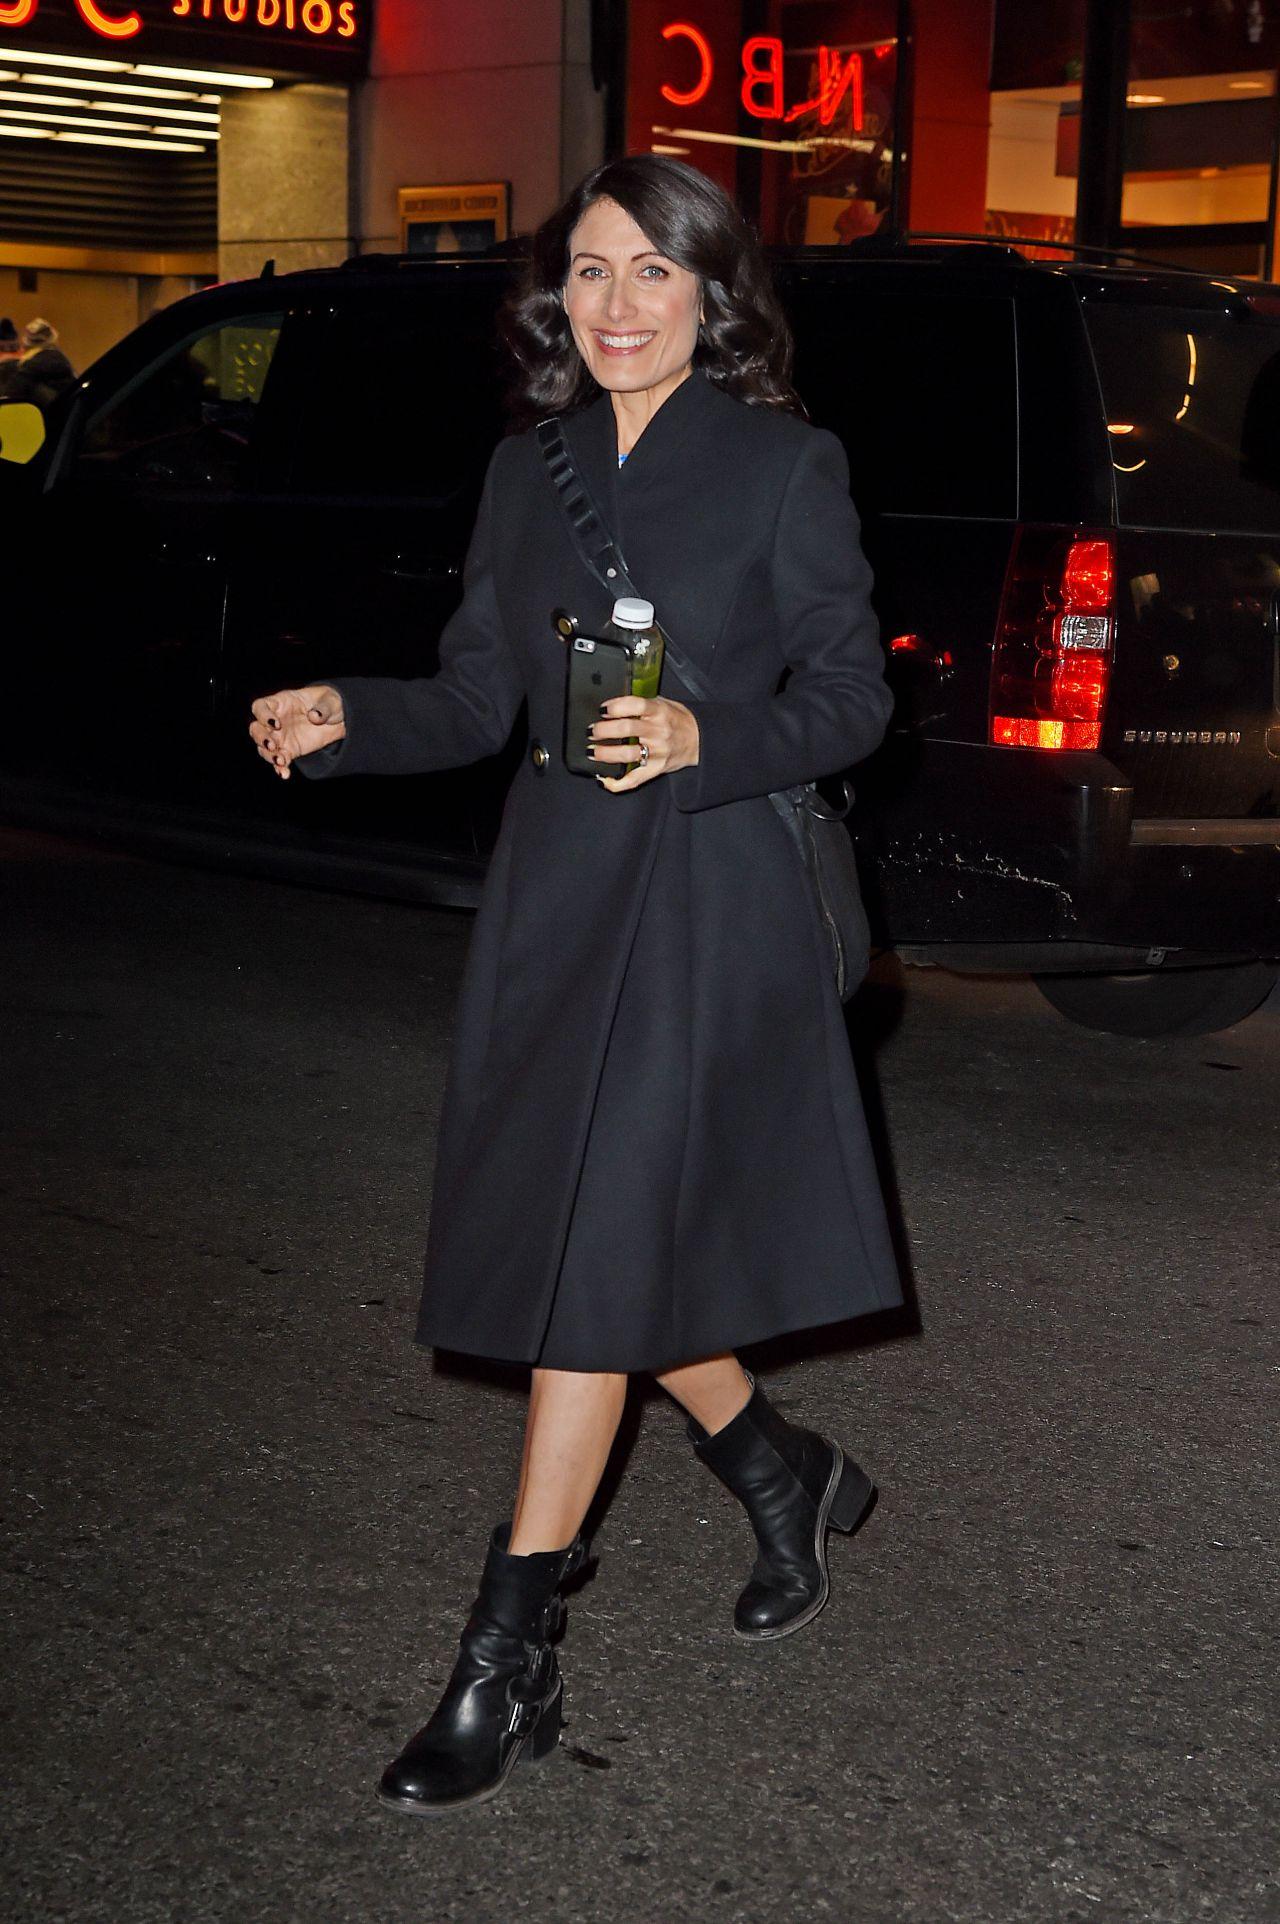 Lisa Edelstein Leaving Nbc Studios In New York 12 3 2015